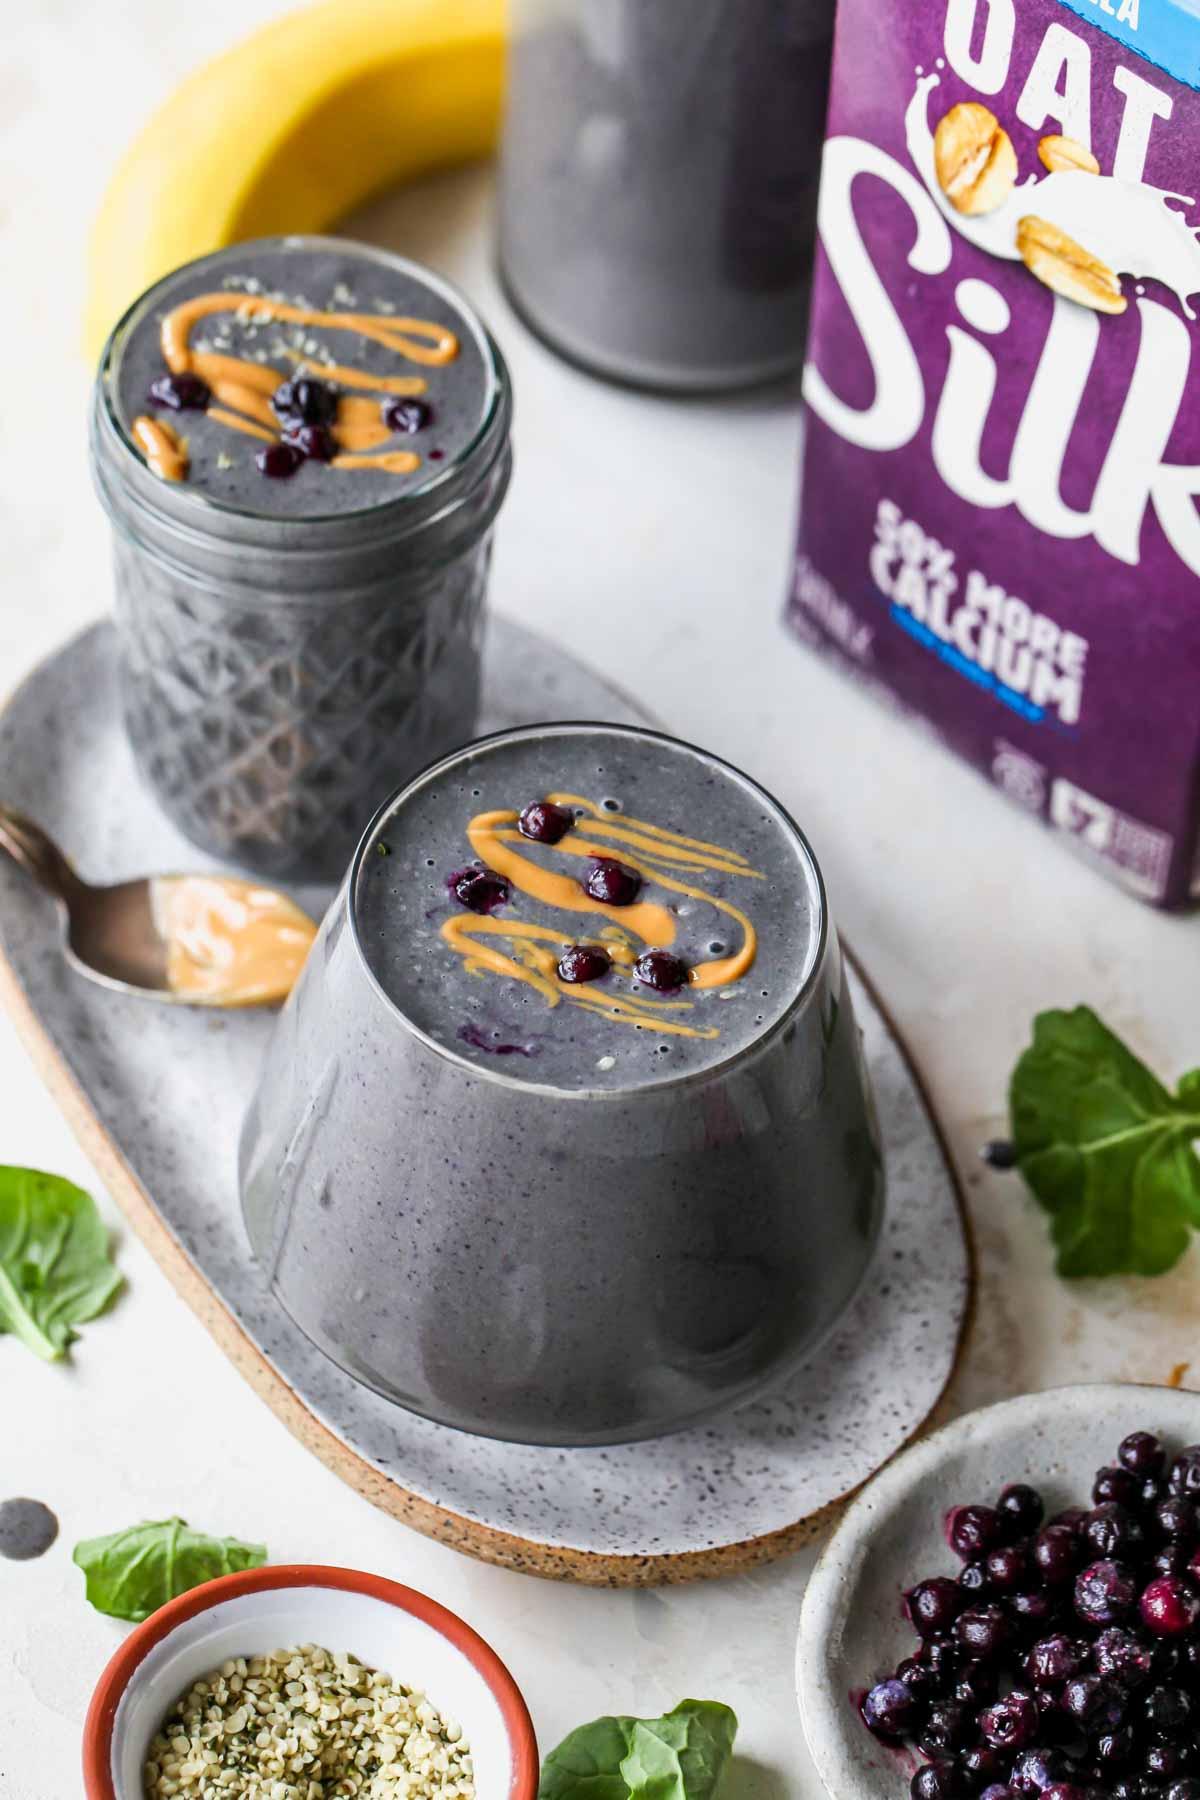 Silk Oatmilk carton next to a berry smoothie